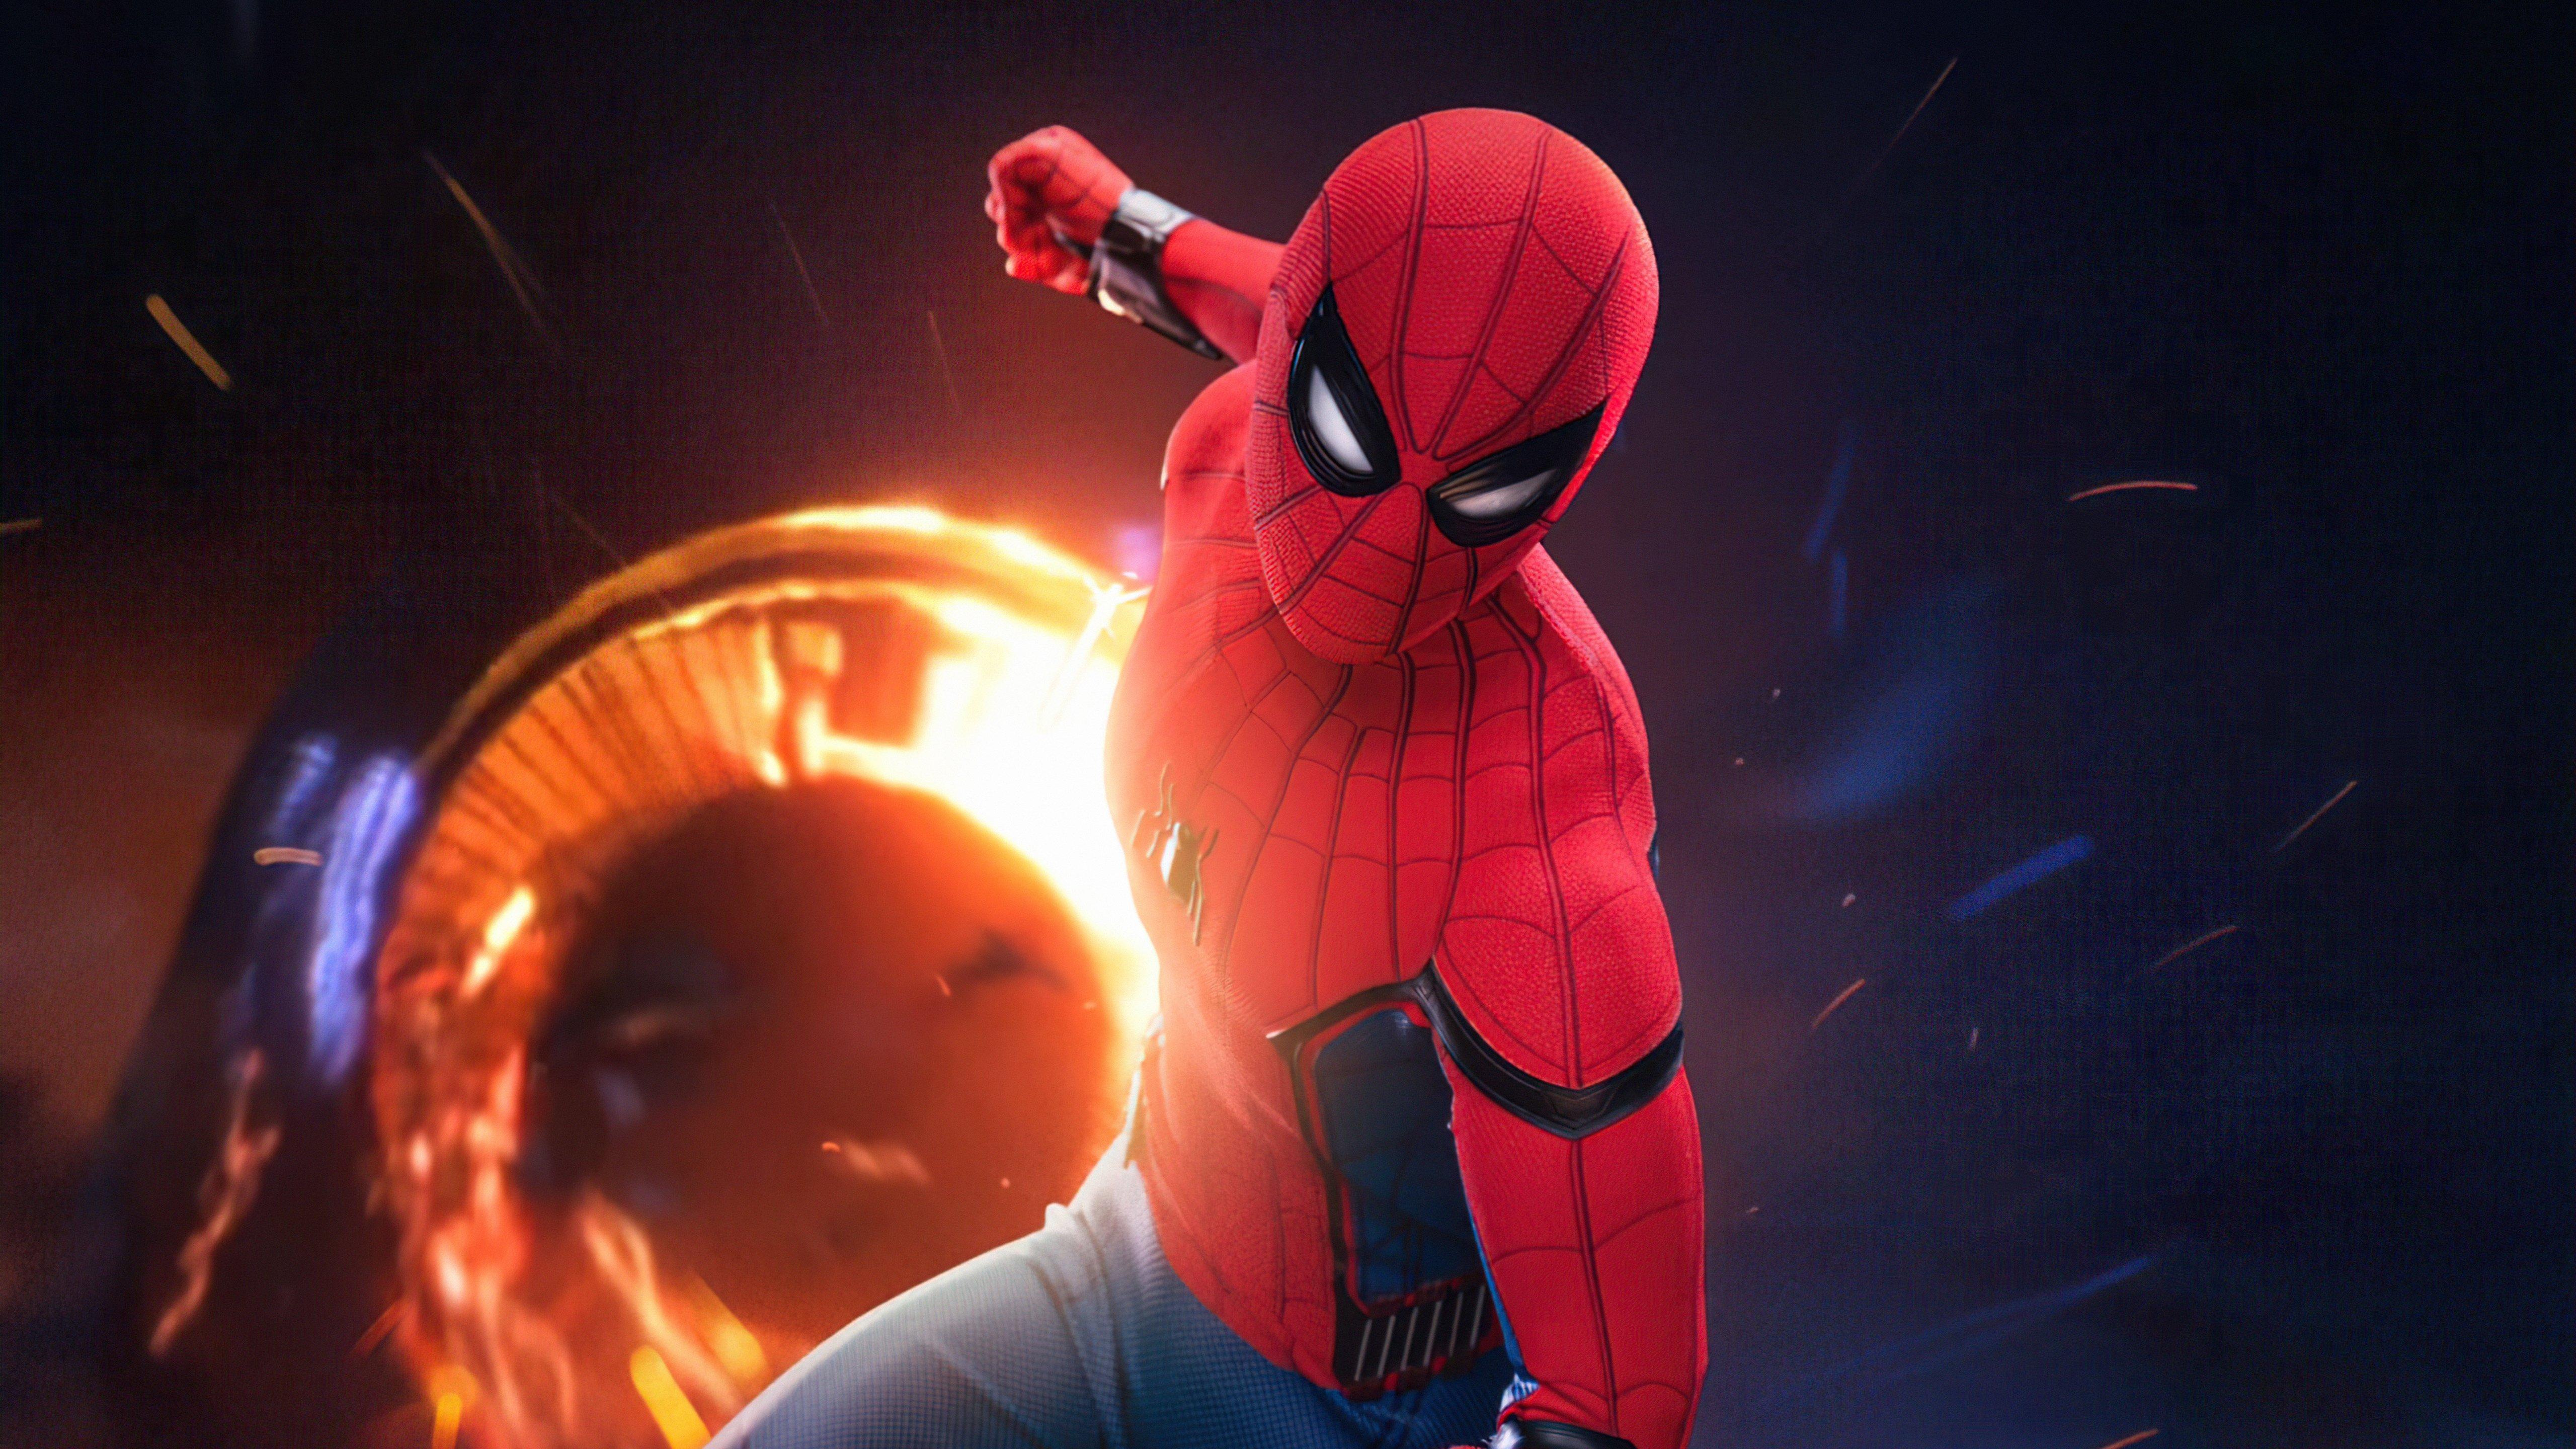 Wallpaper Spider Man Miles Morales